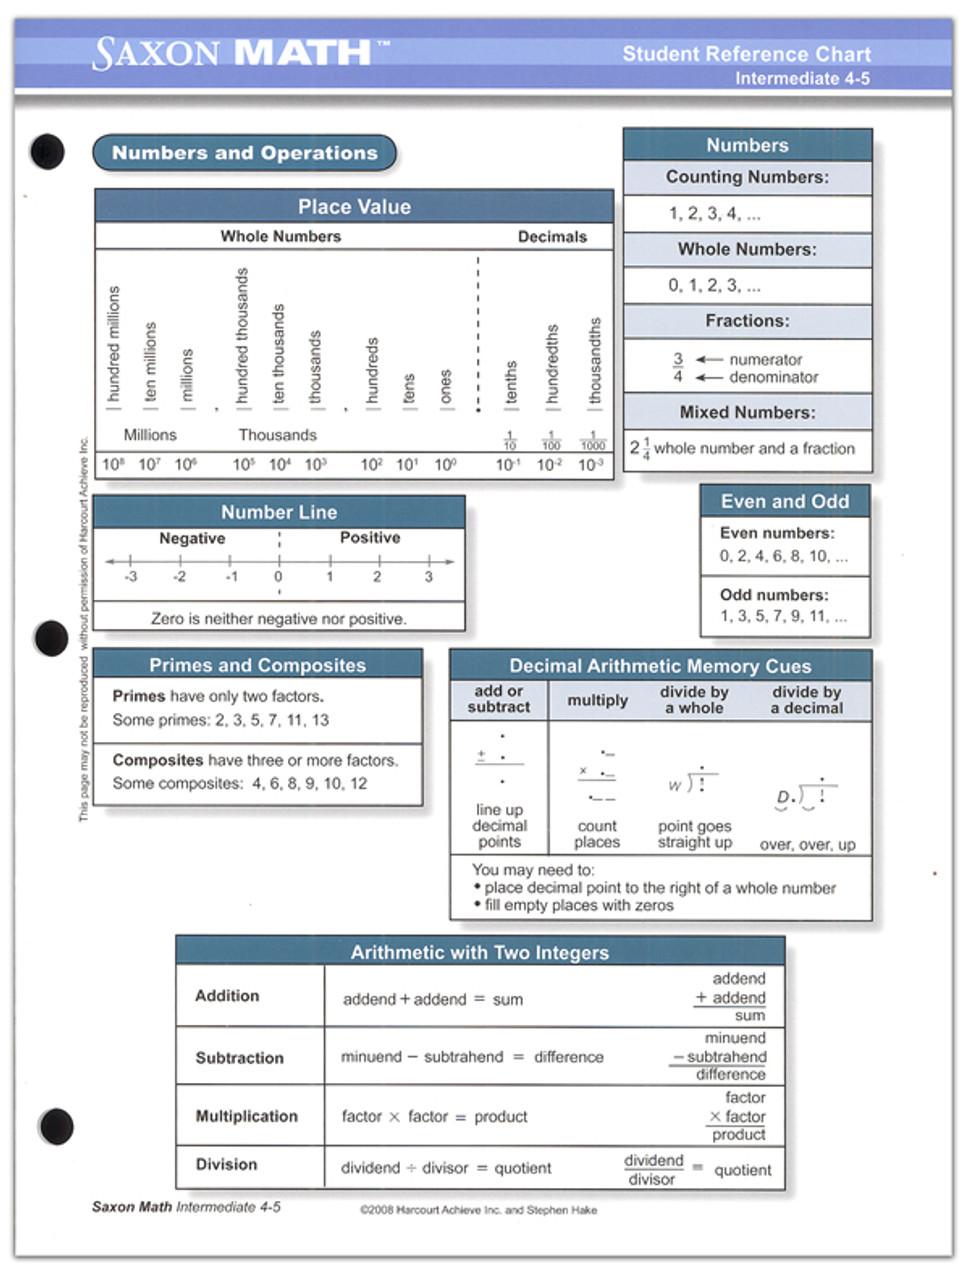 medium resolution of Saxon Math Grade 4-5 Intermediate Student Reference Chart - Classroom  Resource Center